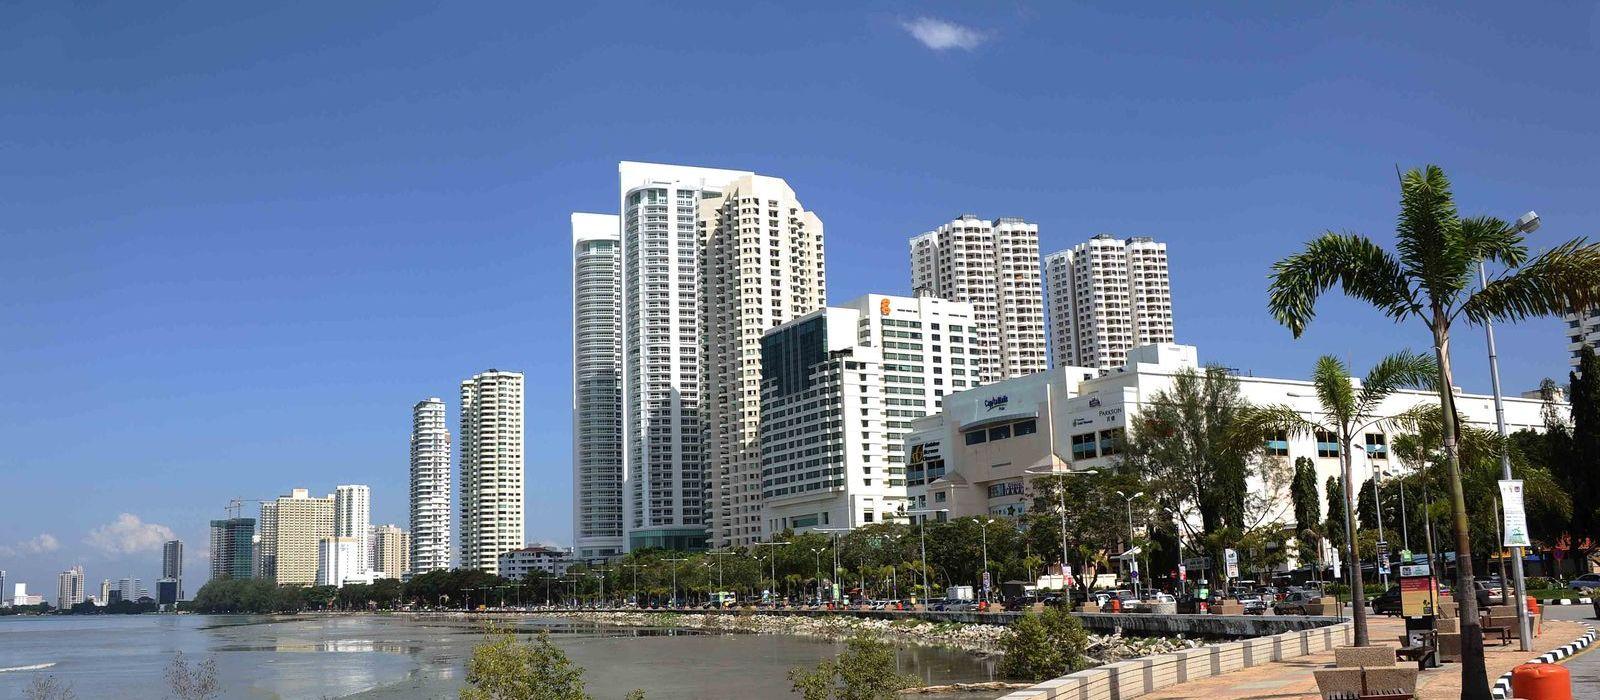 Discover Singapore & Peninsular Malaysia Tour Trip 1